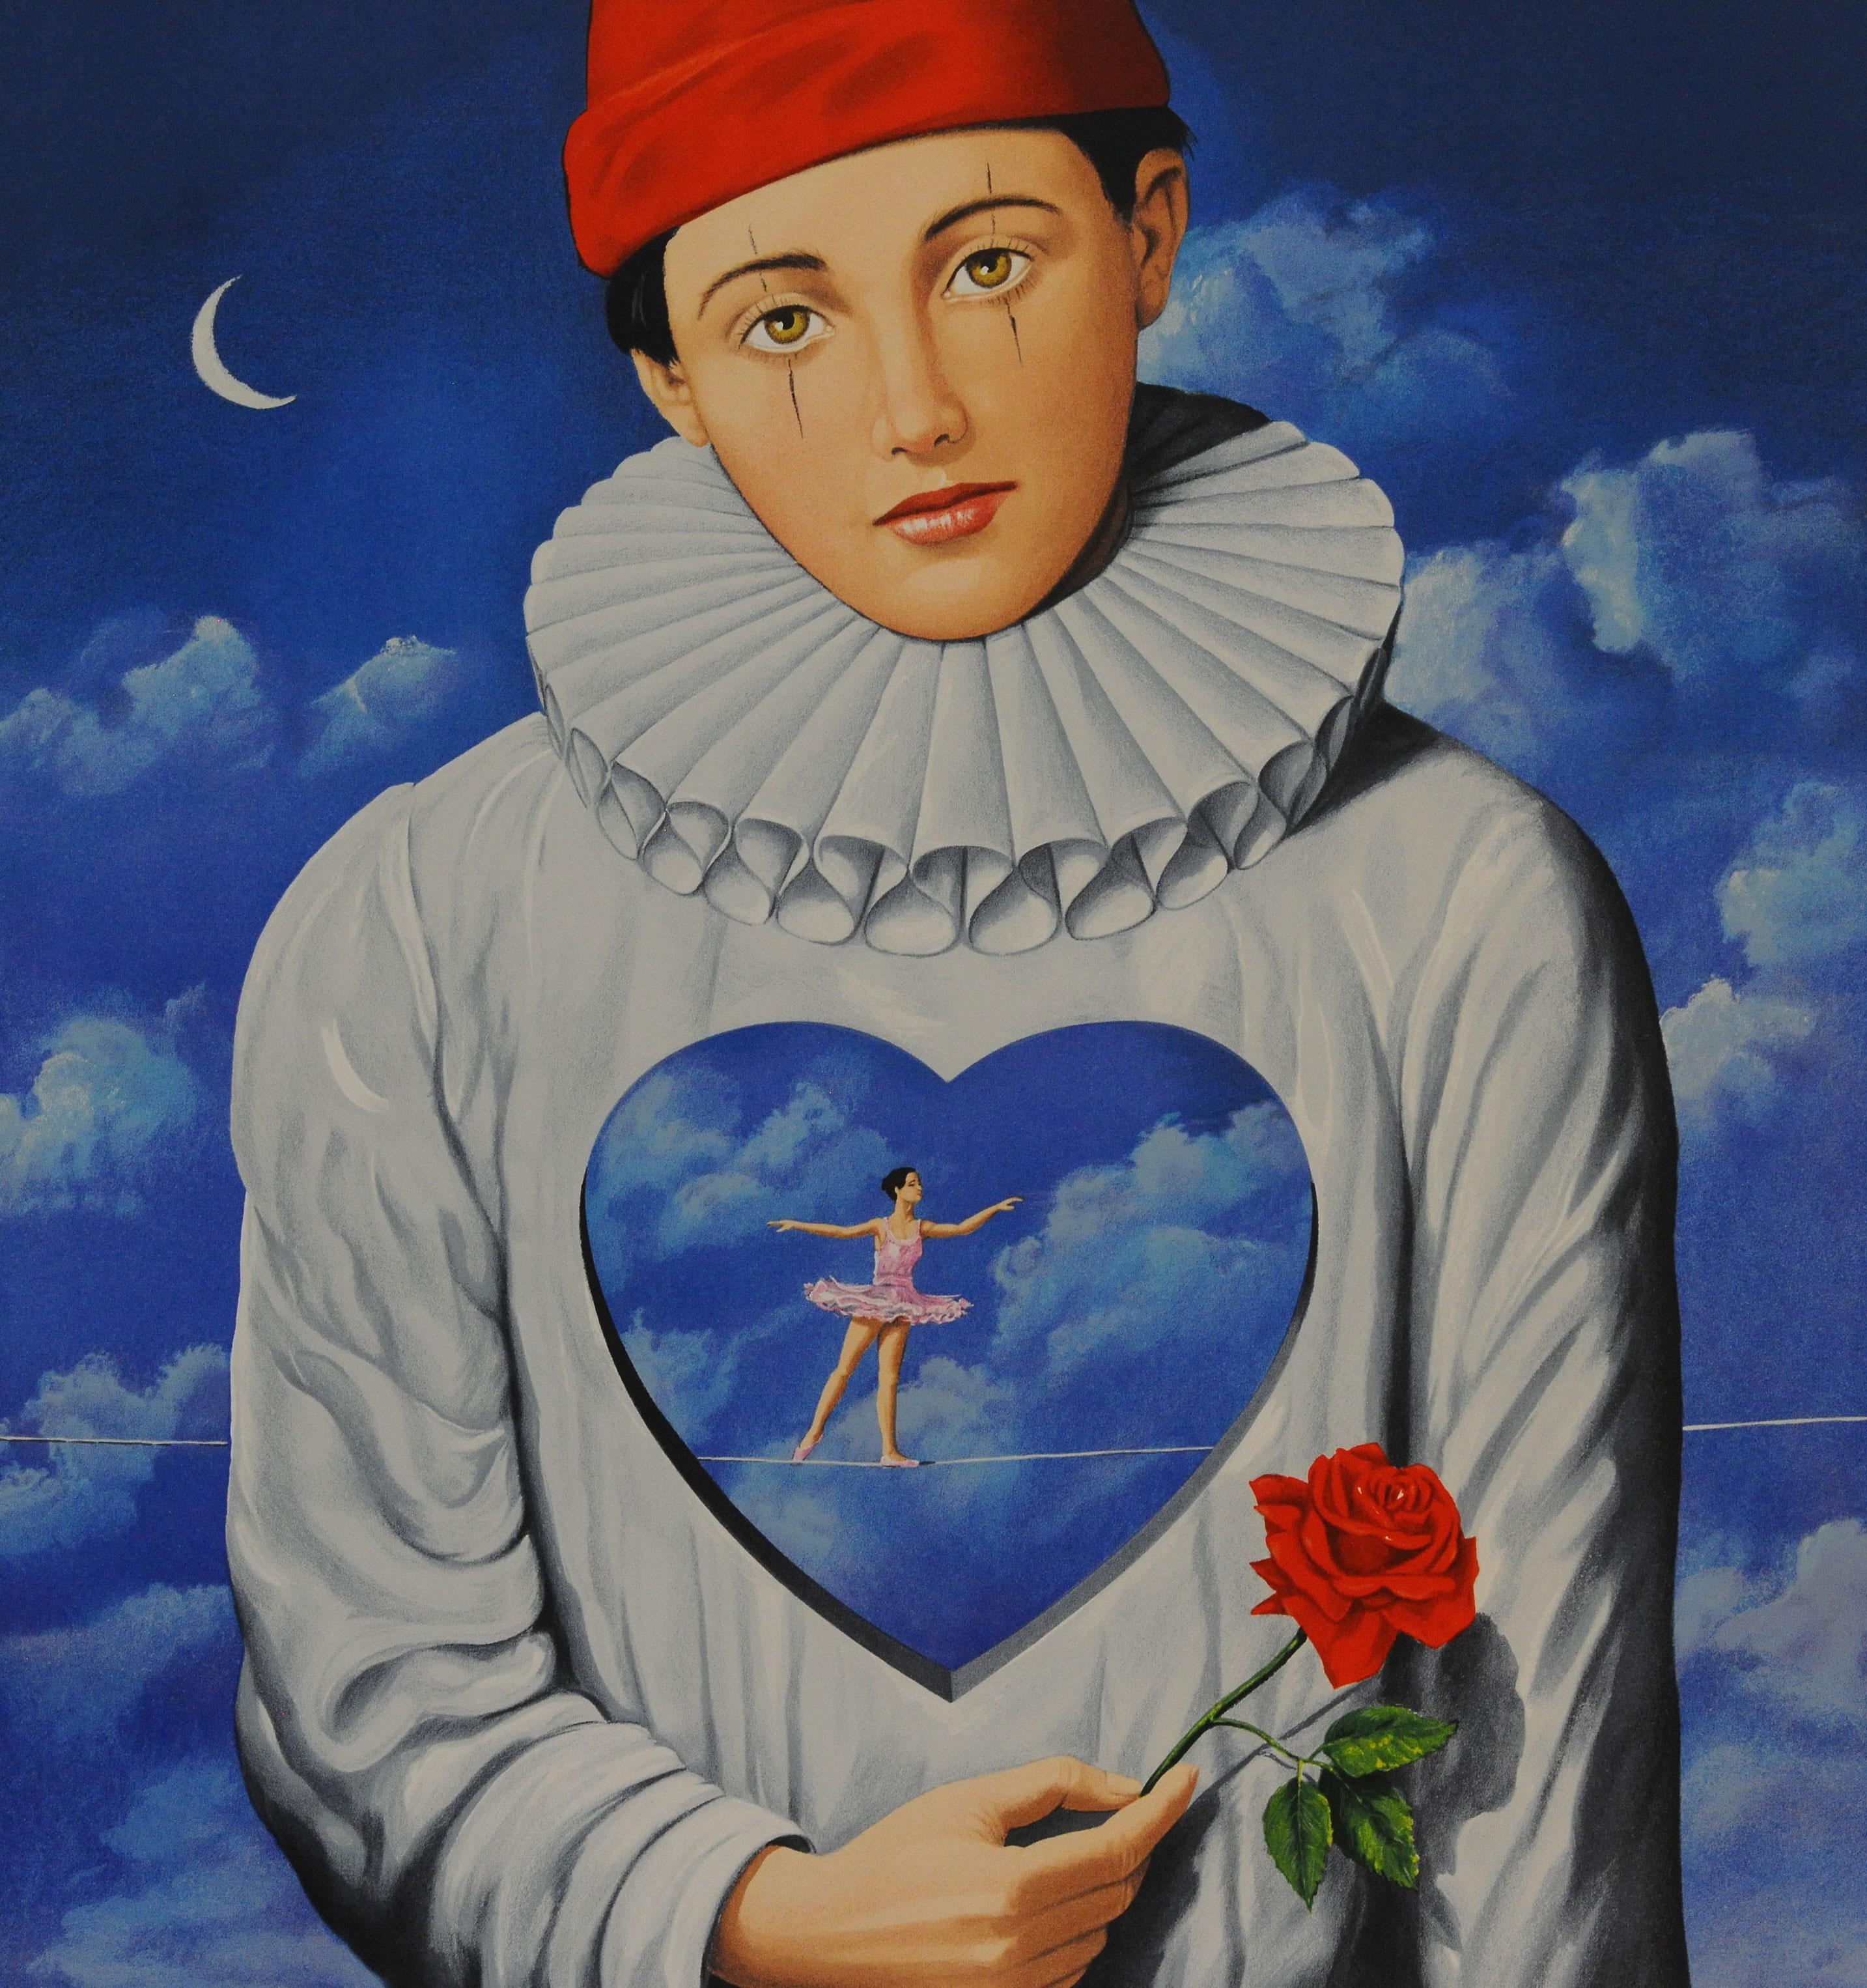 heart ballerina rose sad clown red beanie blue clouds crescent moon